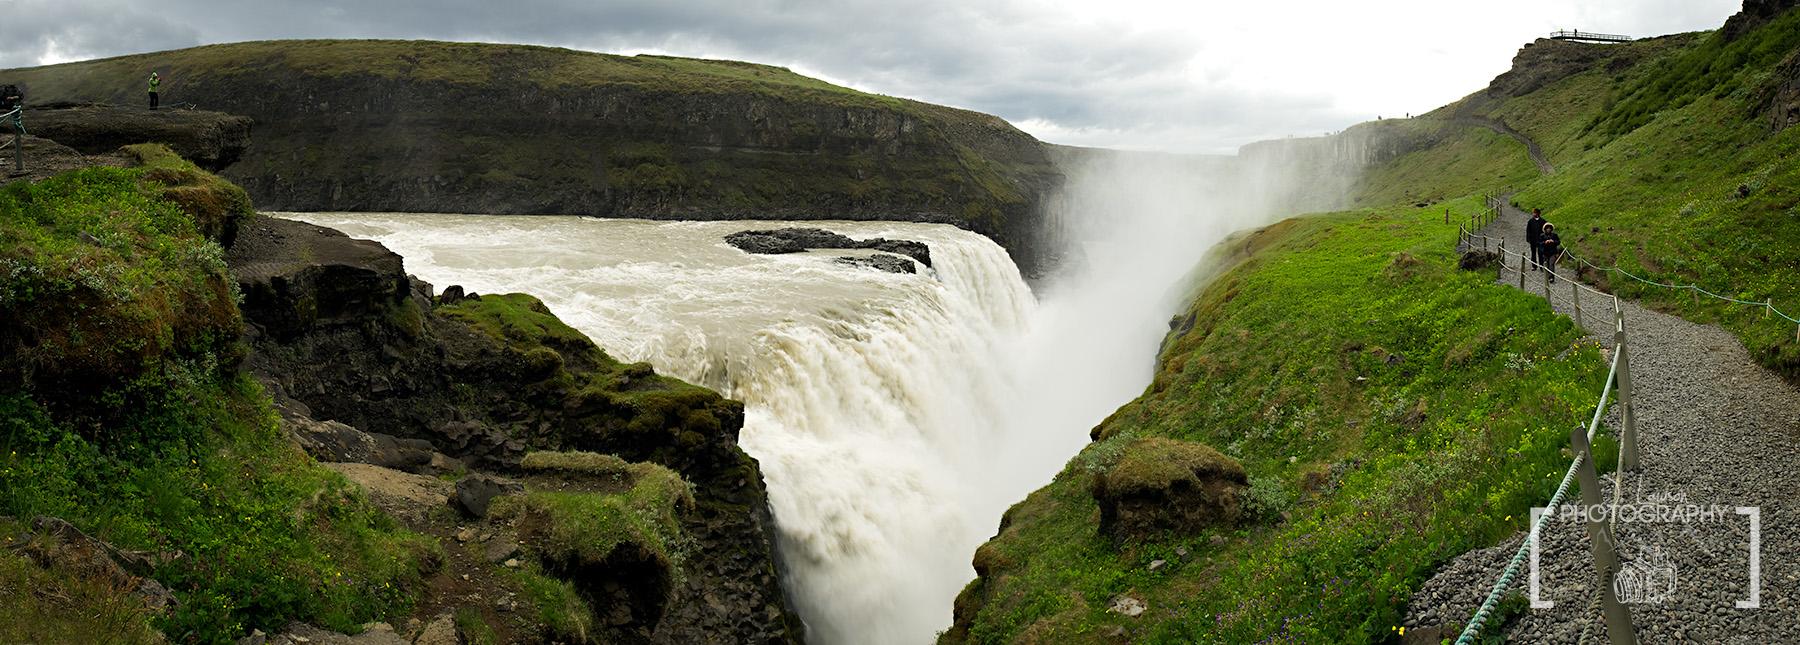 Gullfoss, Iceland. IcelandPhotography, Photo Credit: Jared Lawson